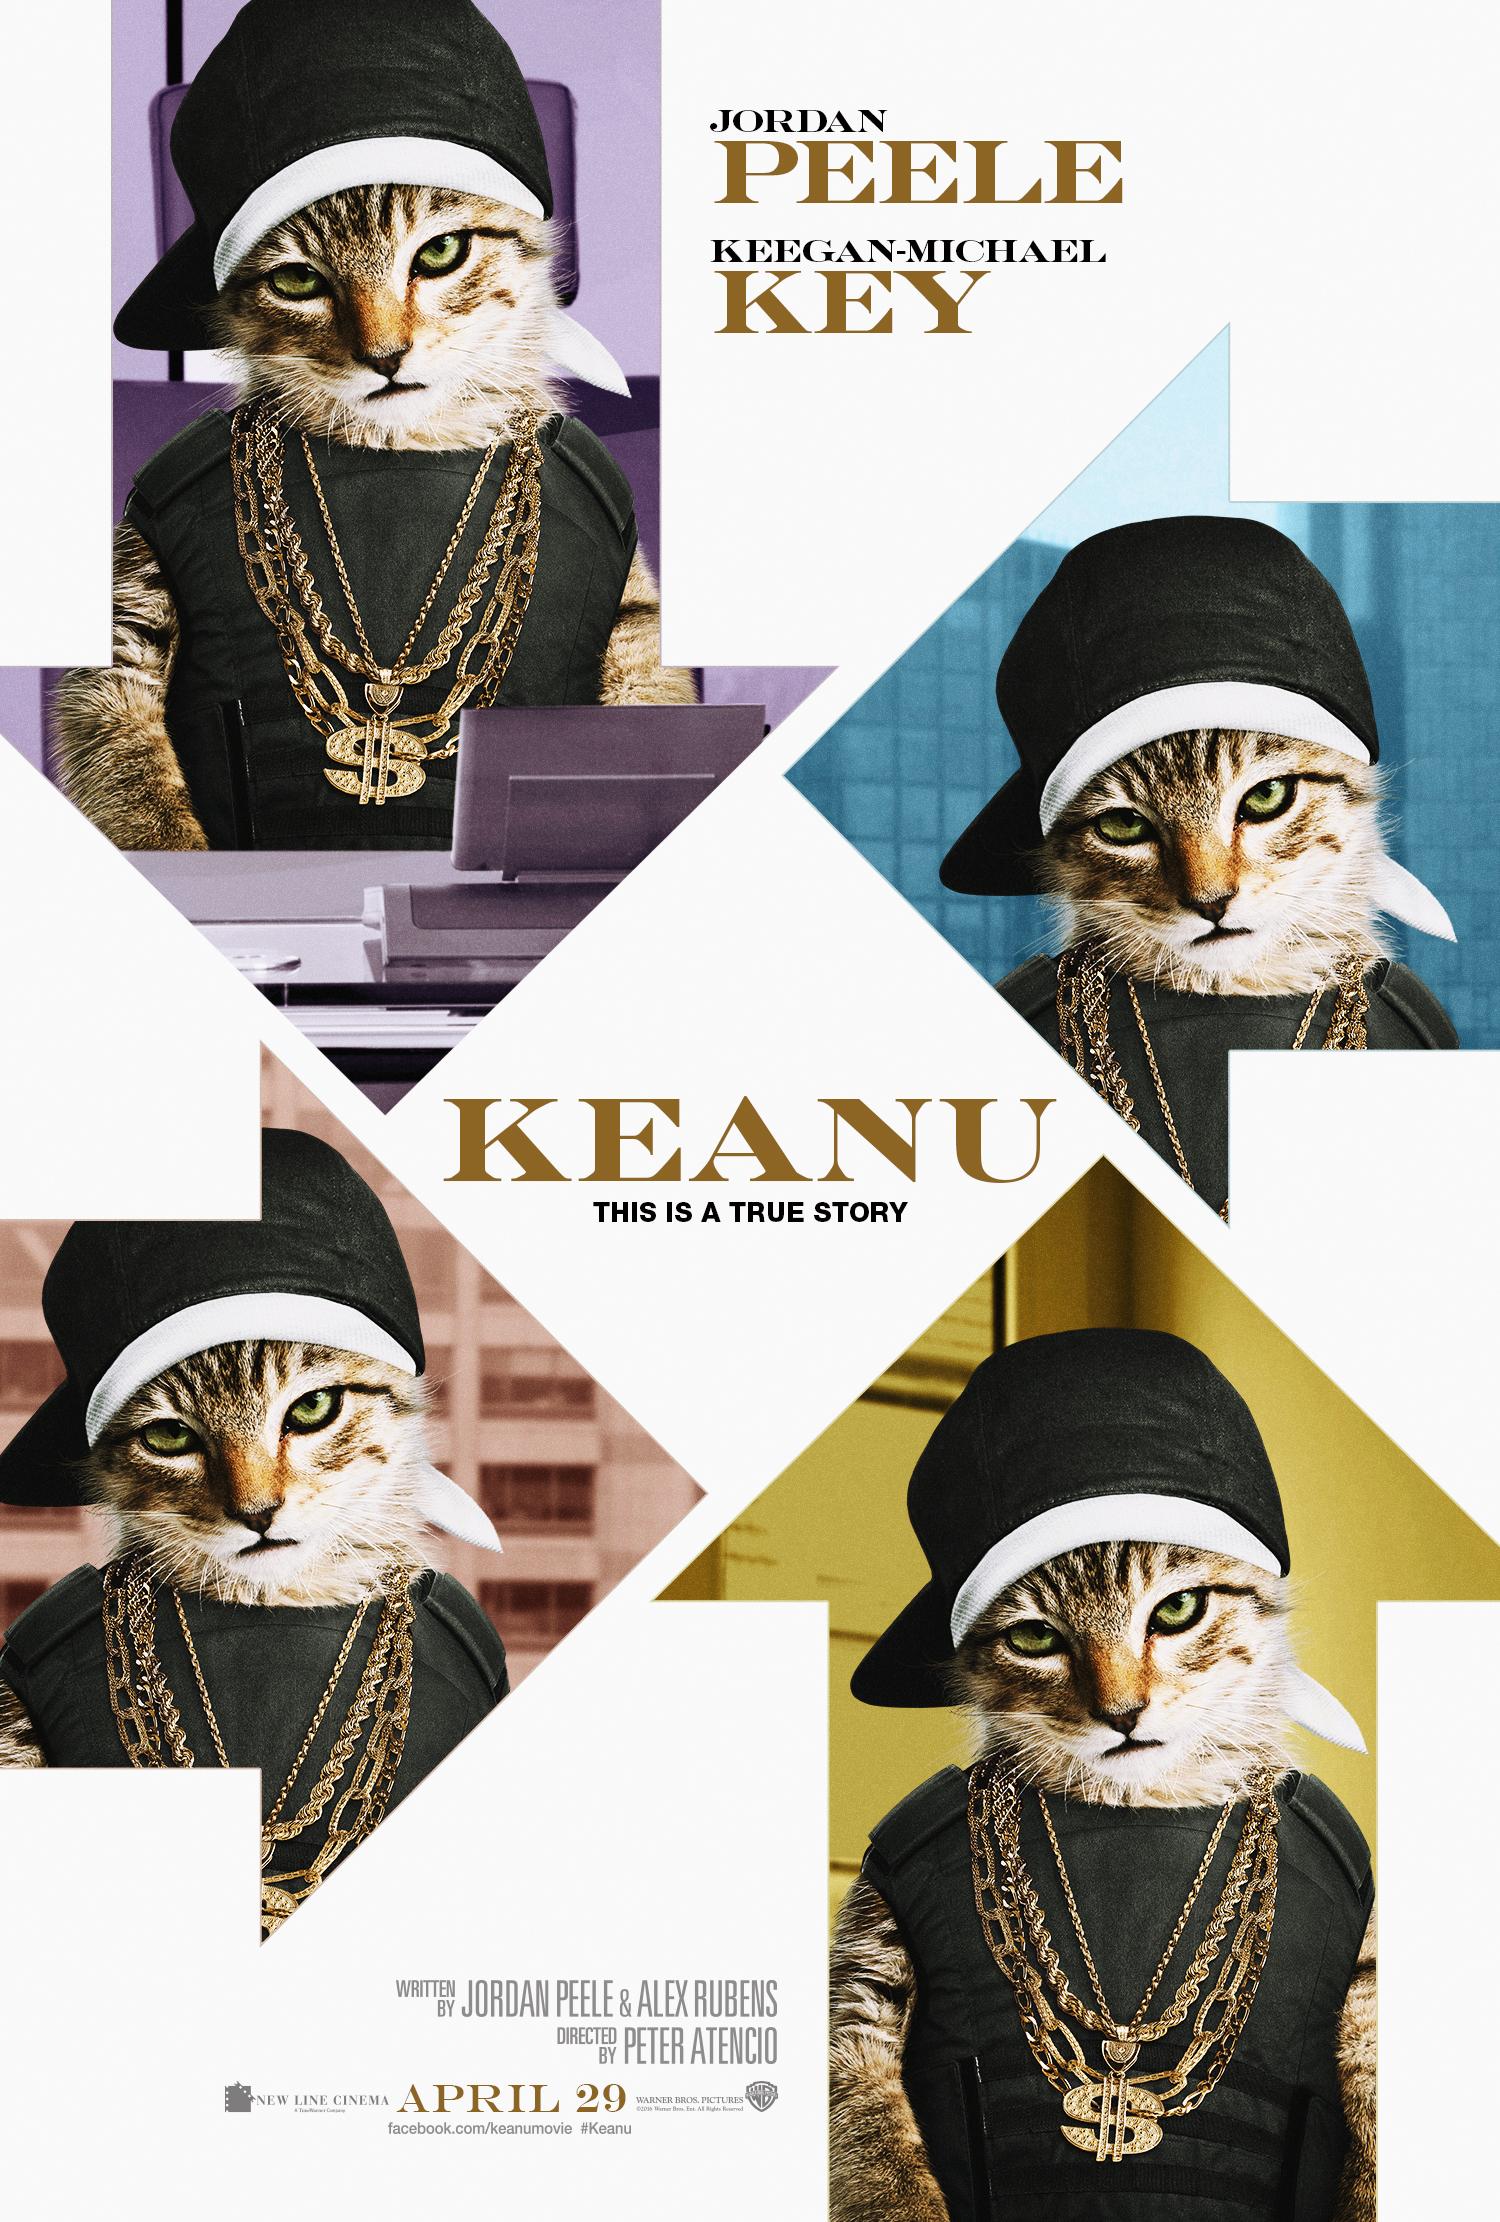 KEANU_OSCARS_THE_BIG_SHORT_master